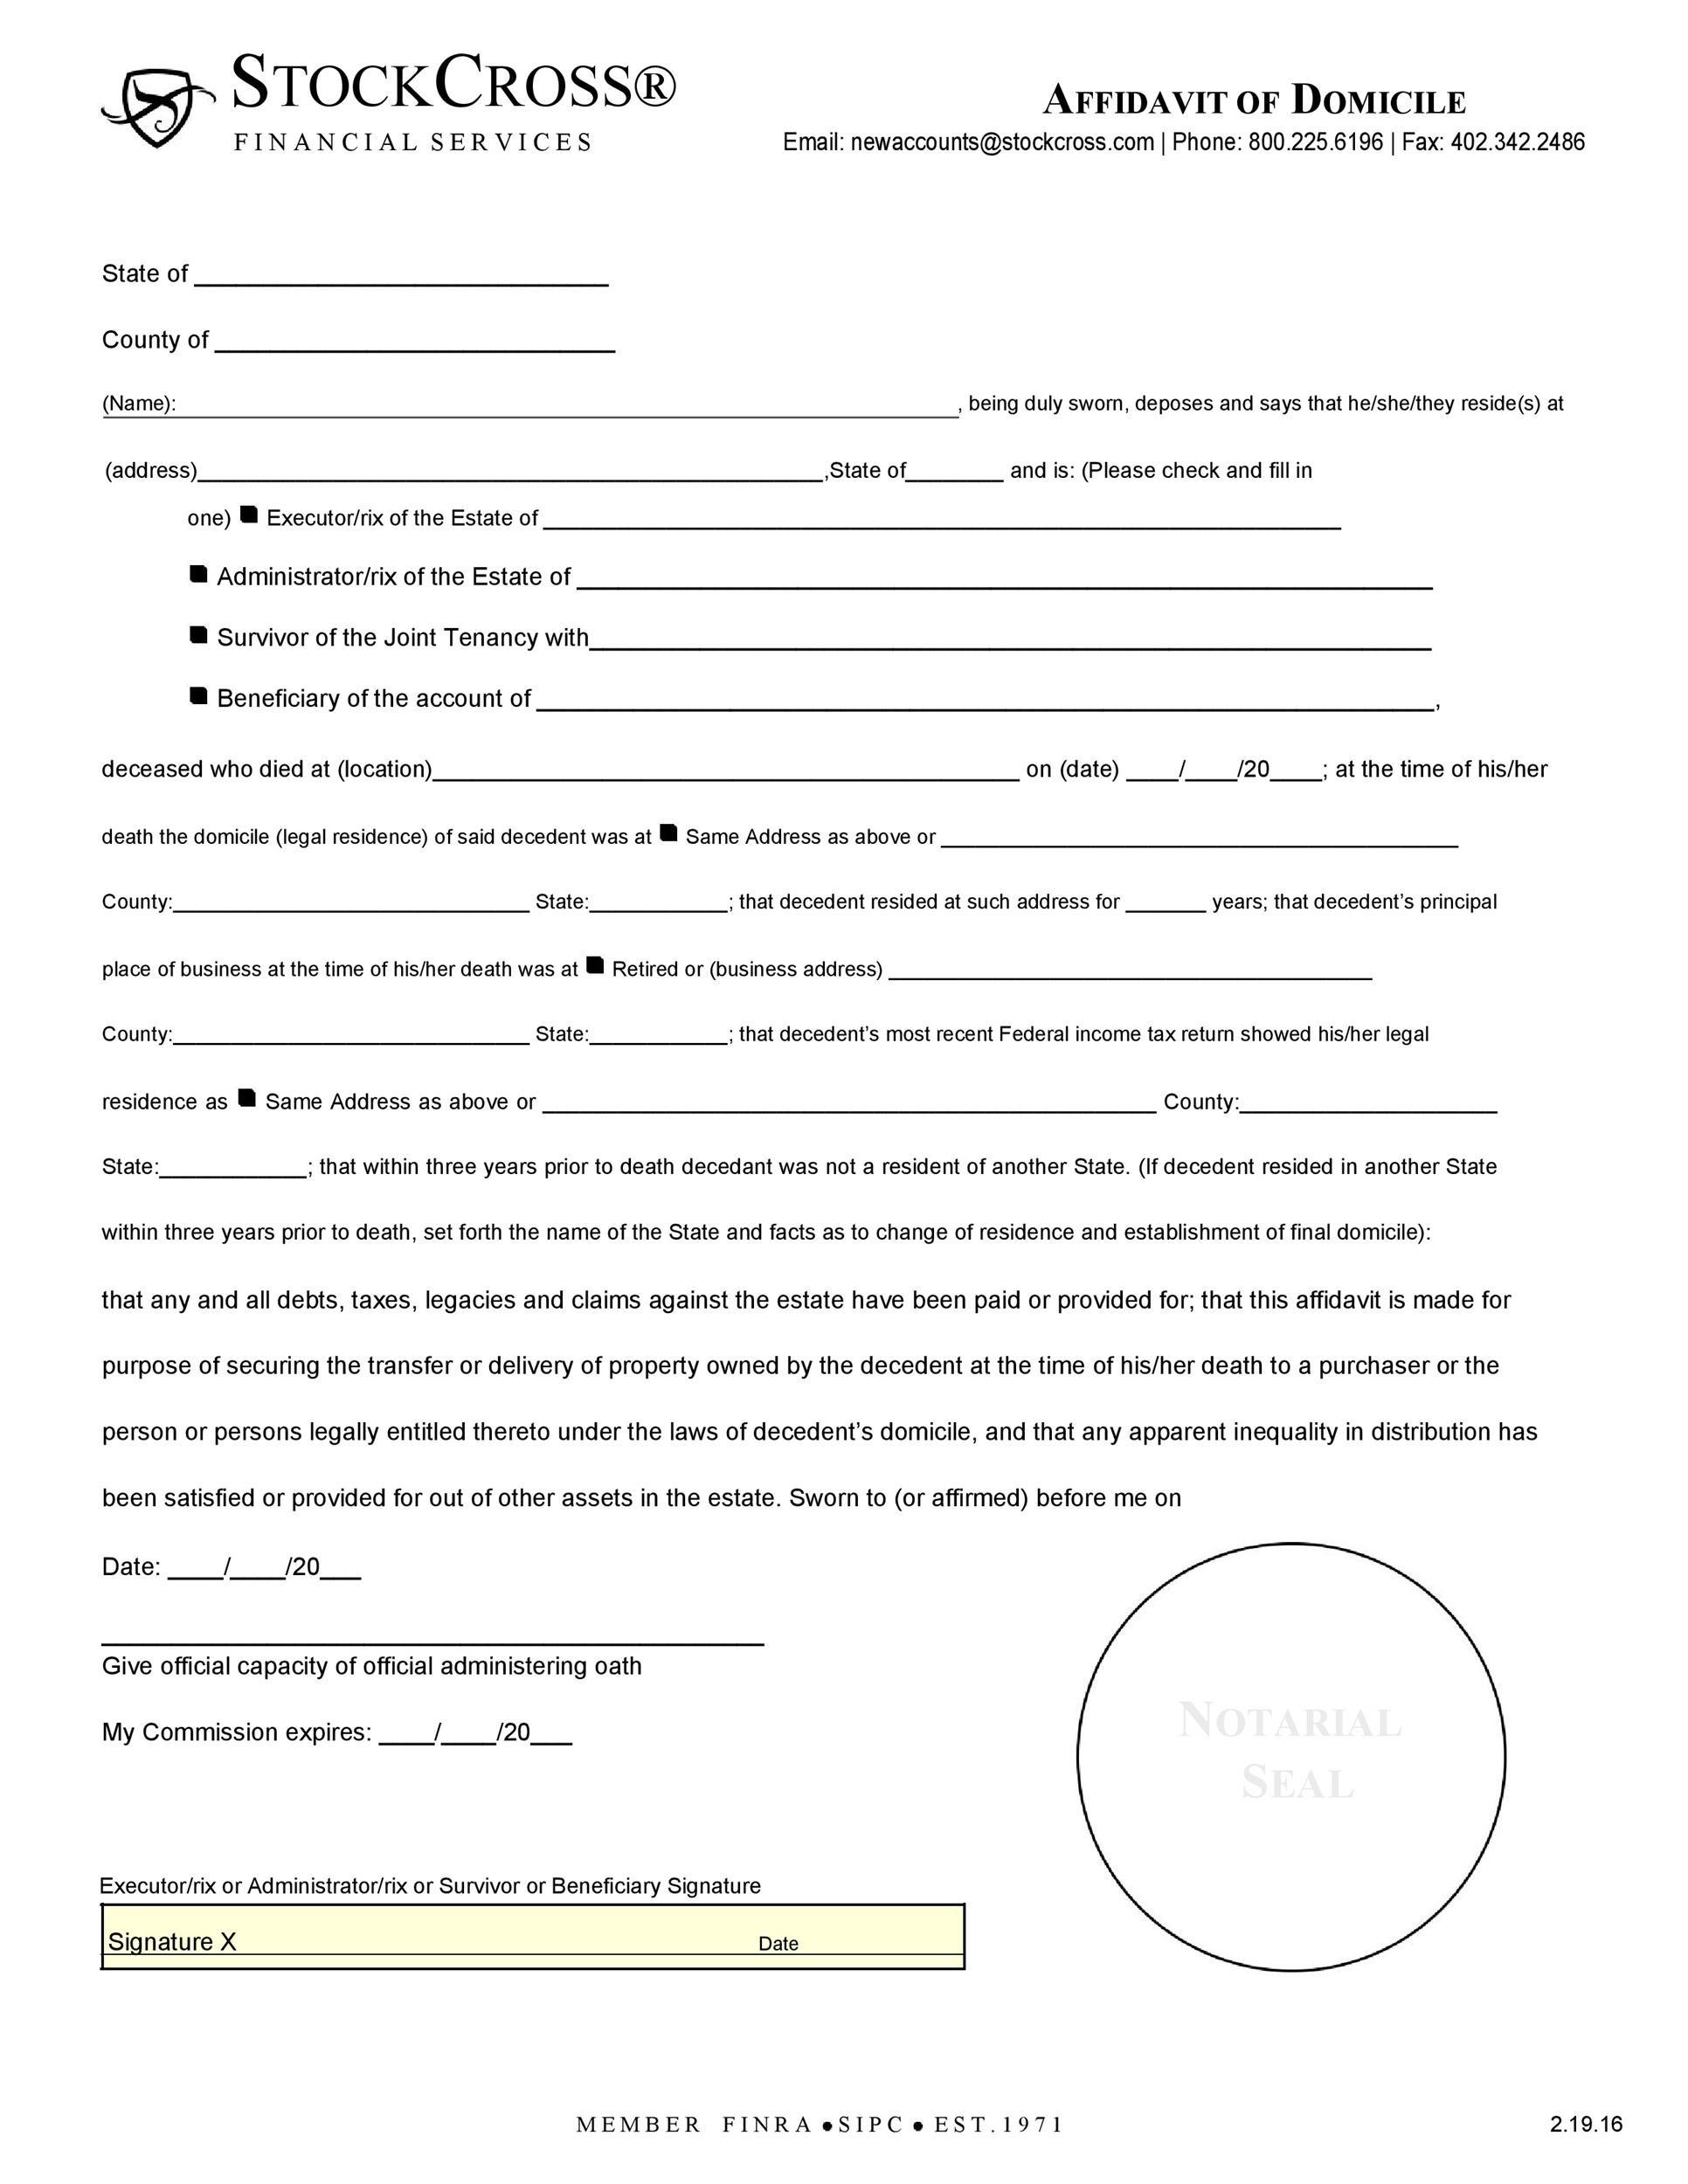 Free affidavit of domicile 44